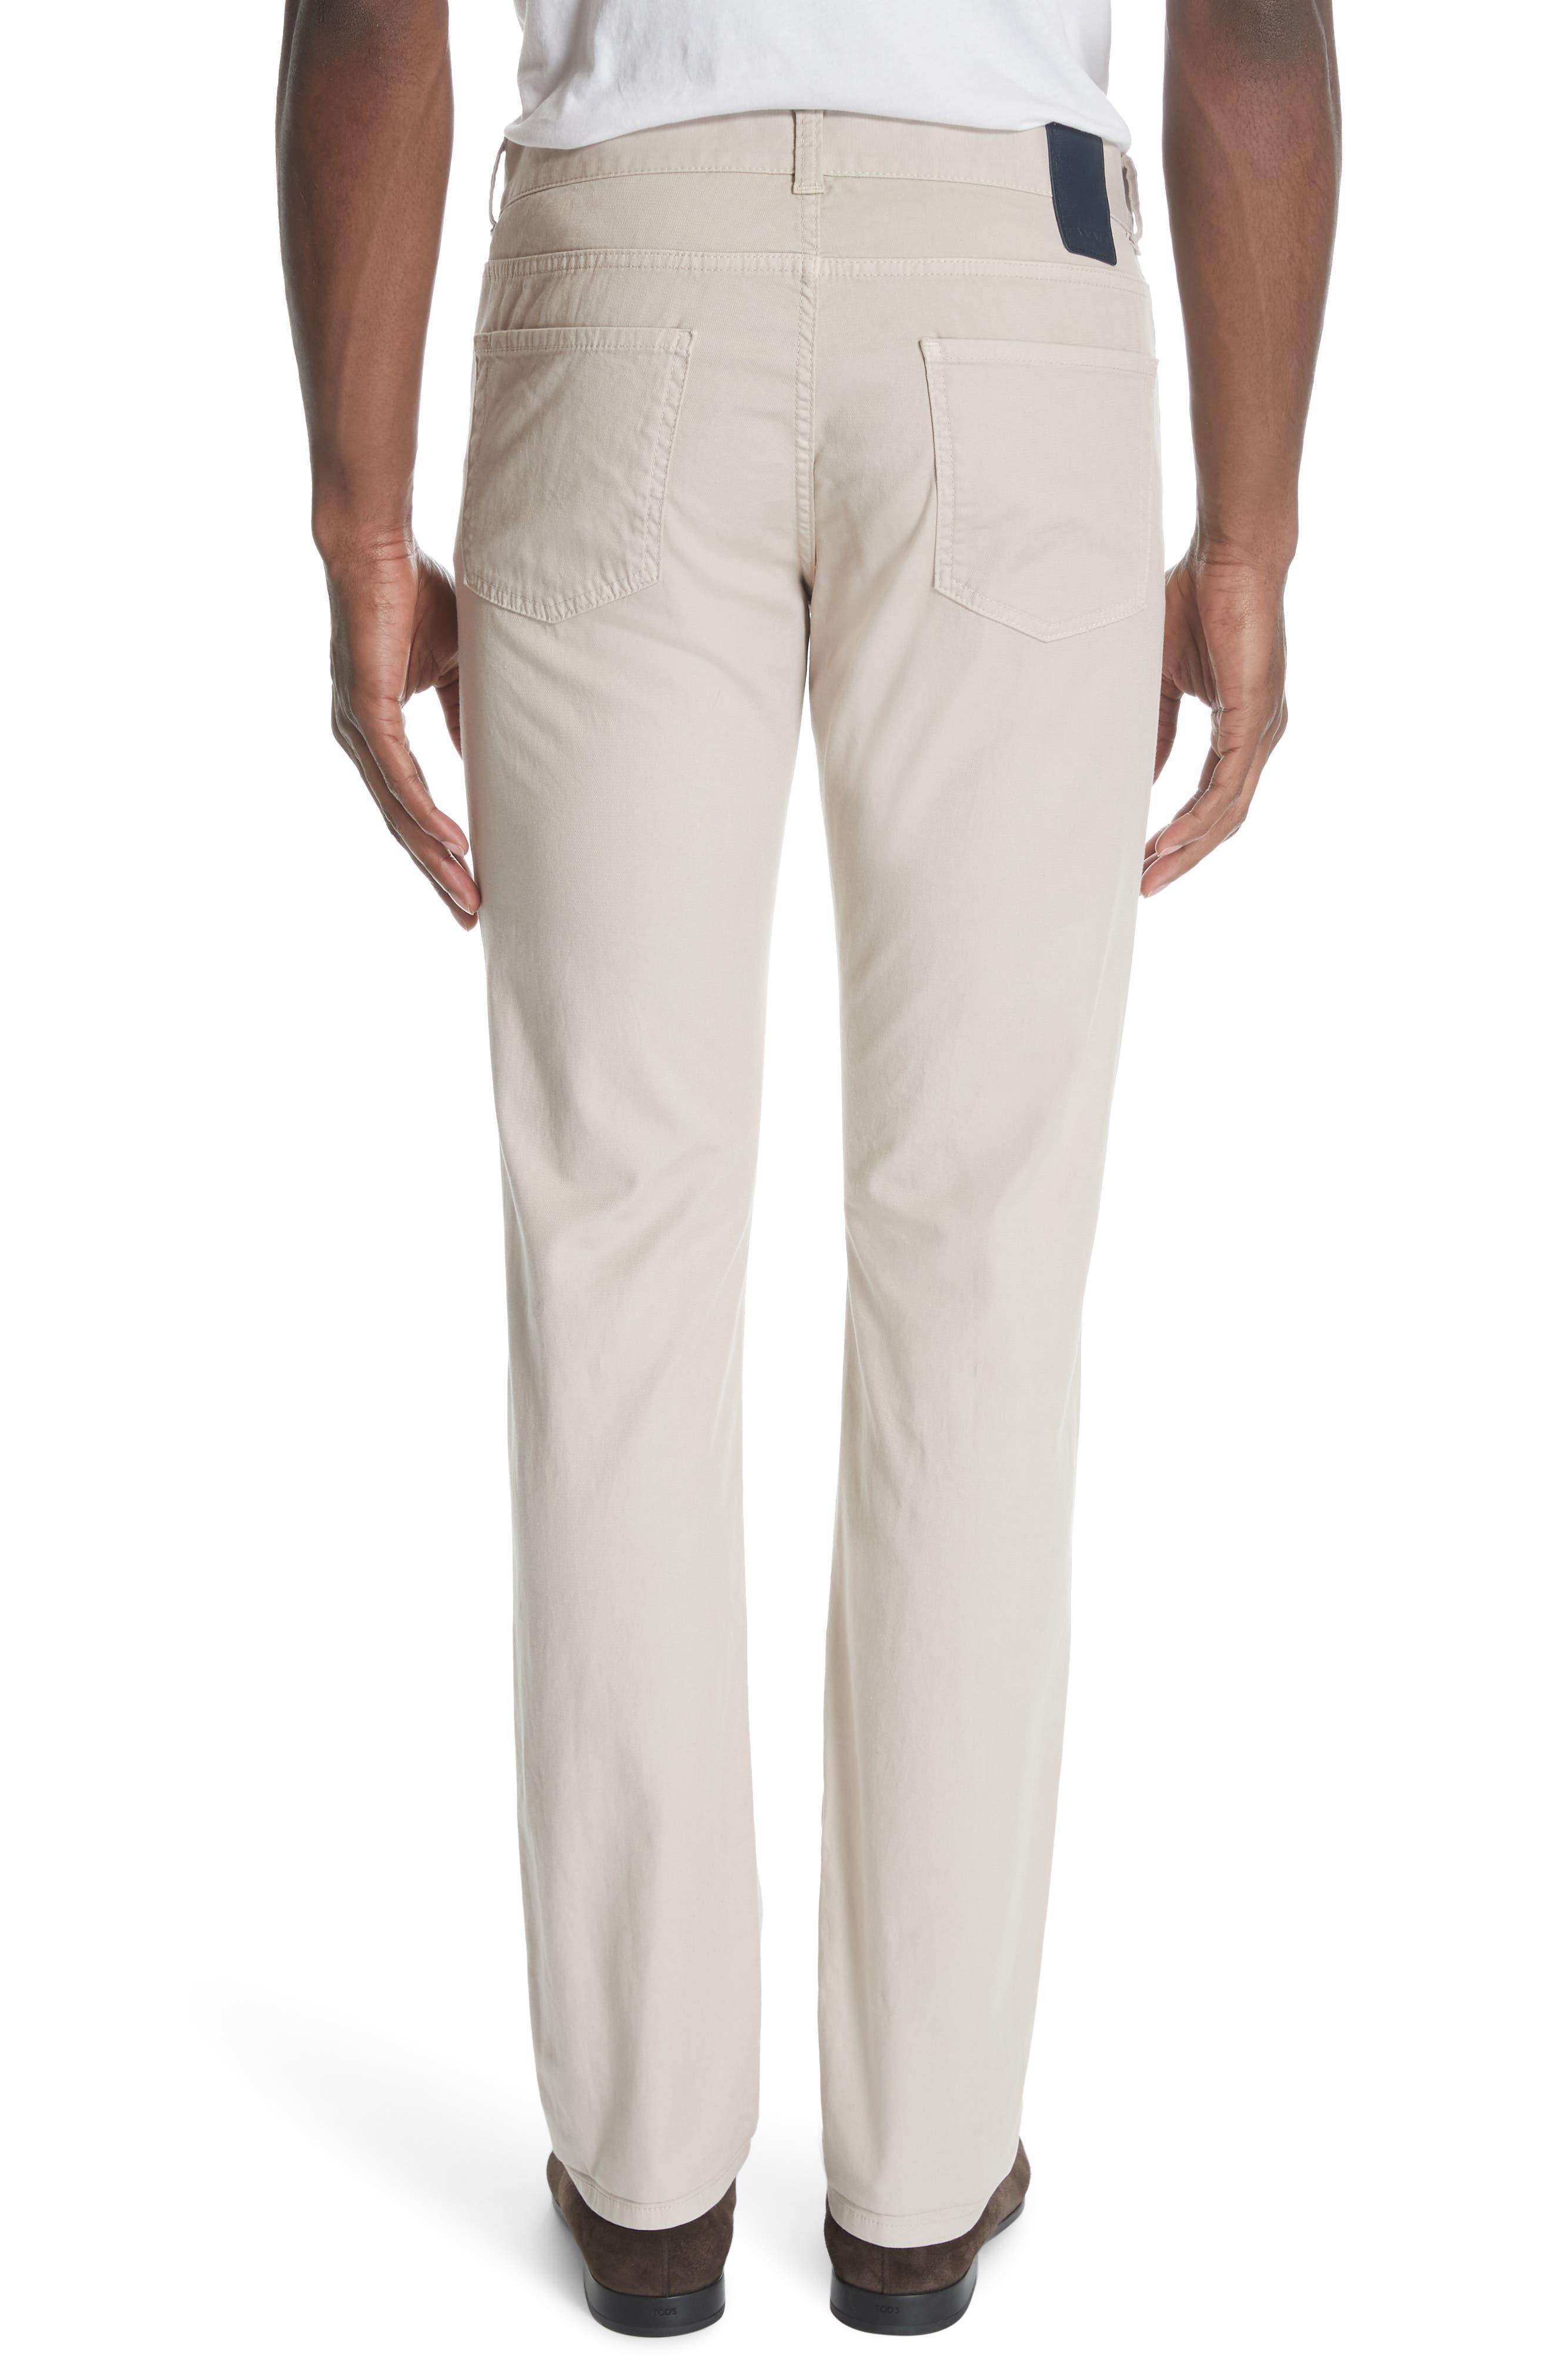 CANALI, Stretch Cotton Five Pocket Trousers, Alternate thumbnail 2, color, BEIGE